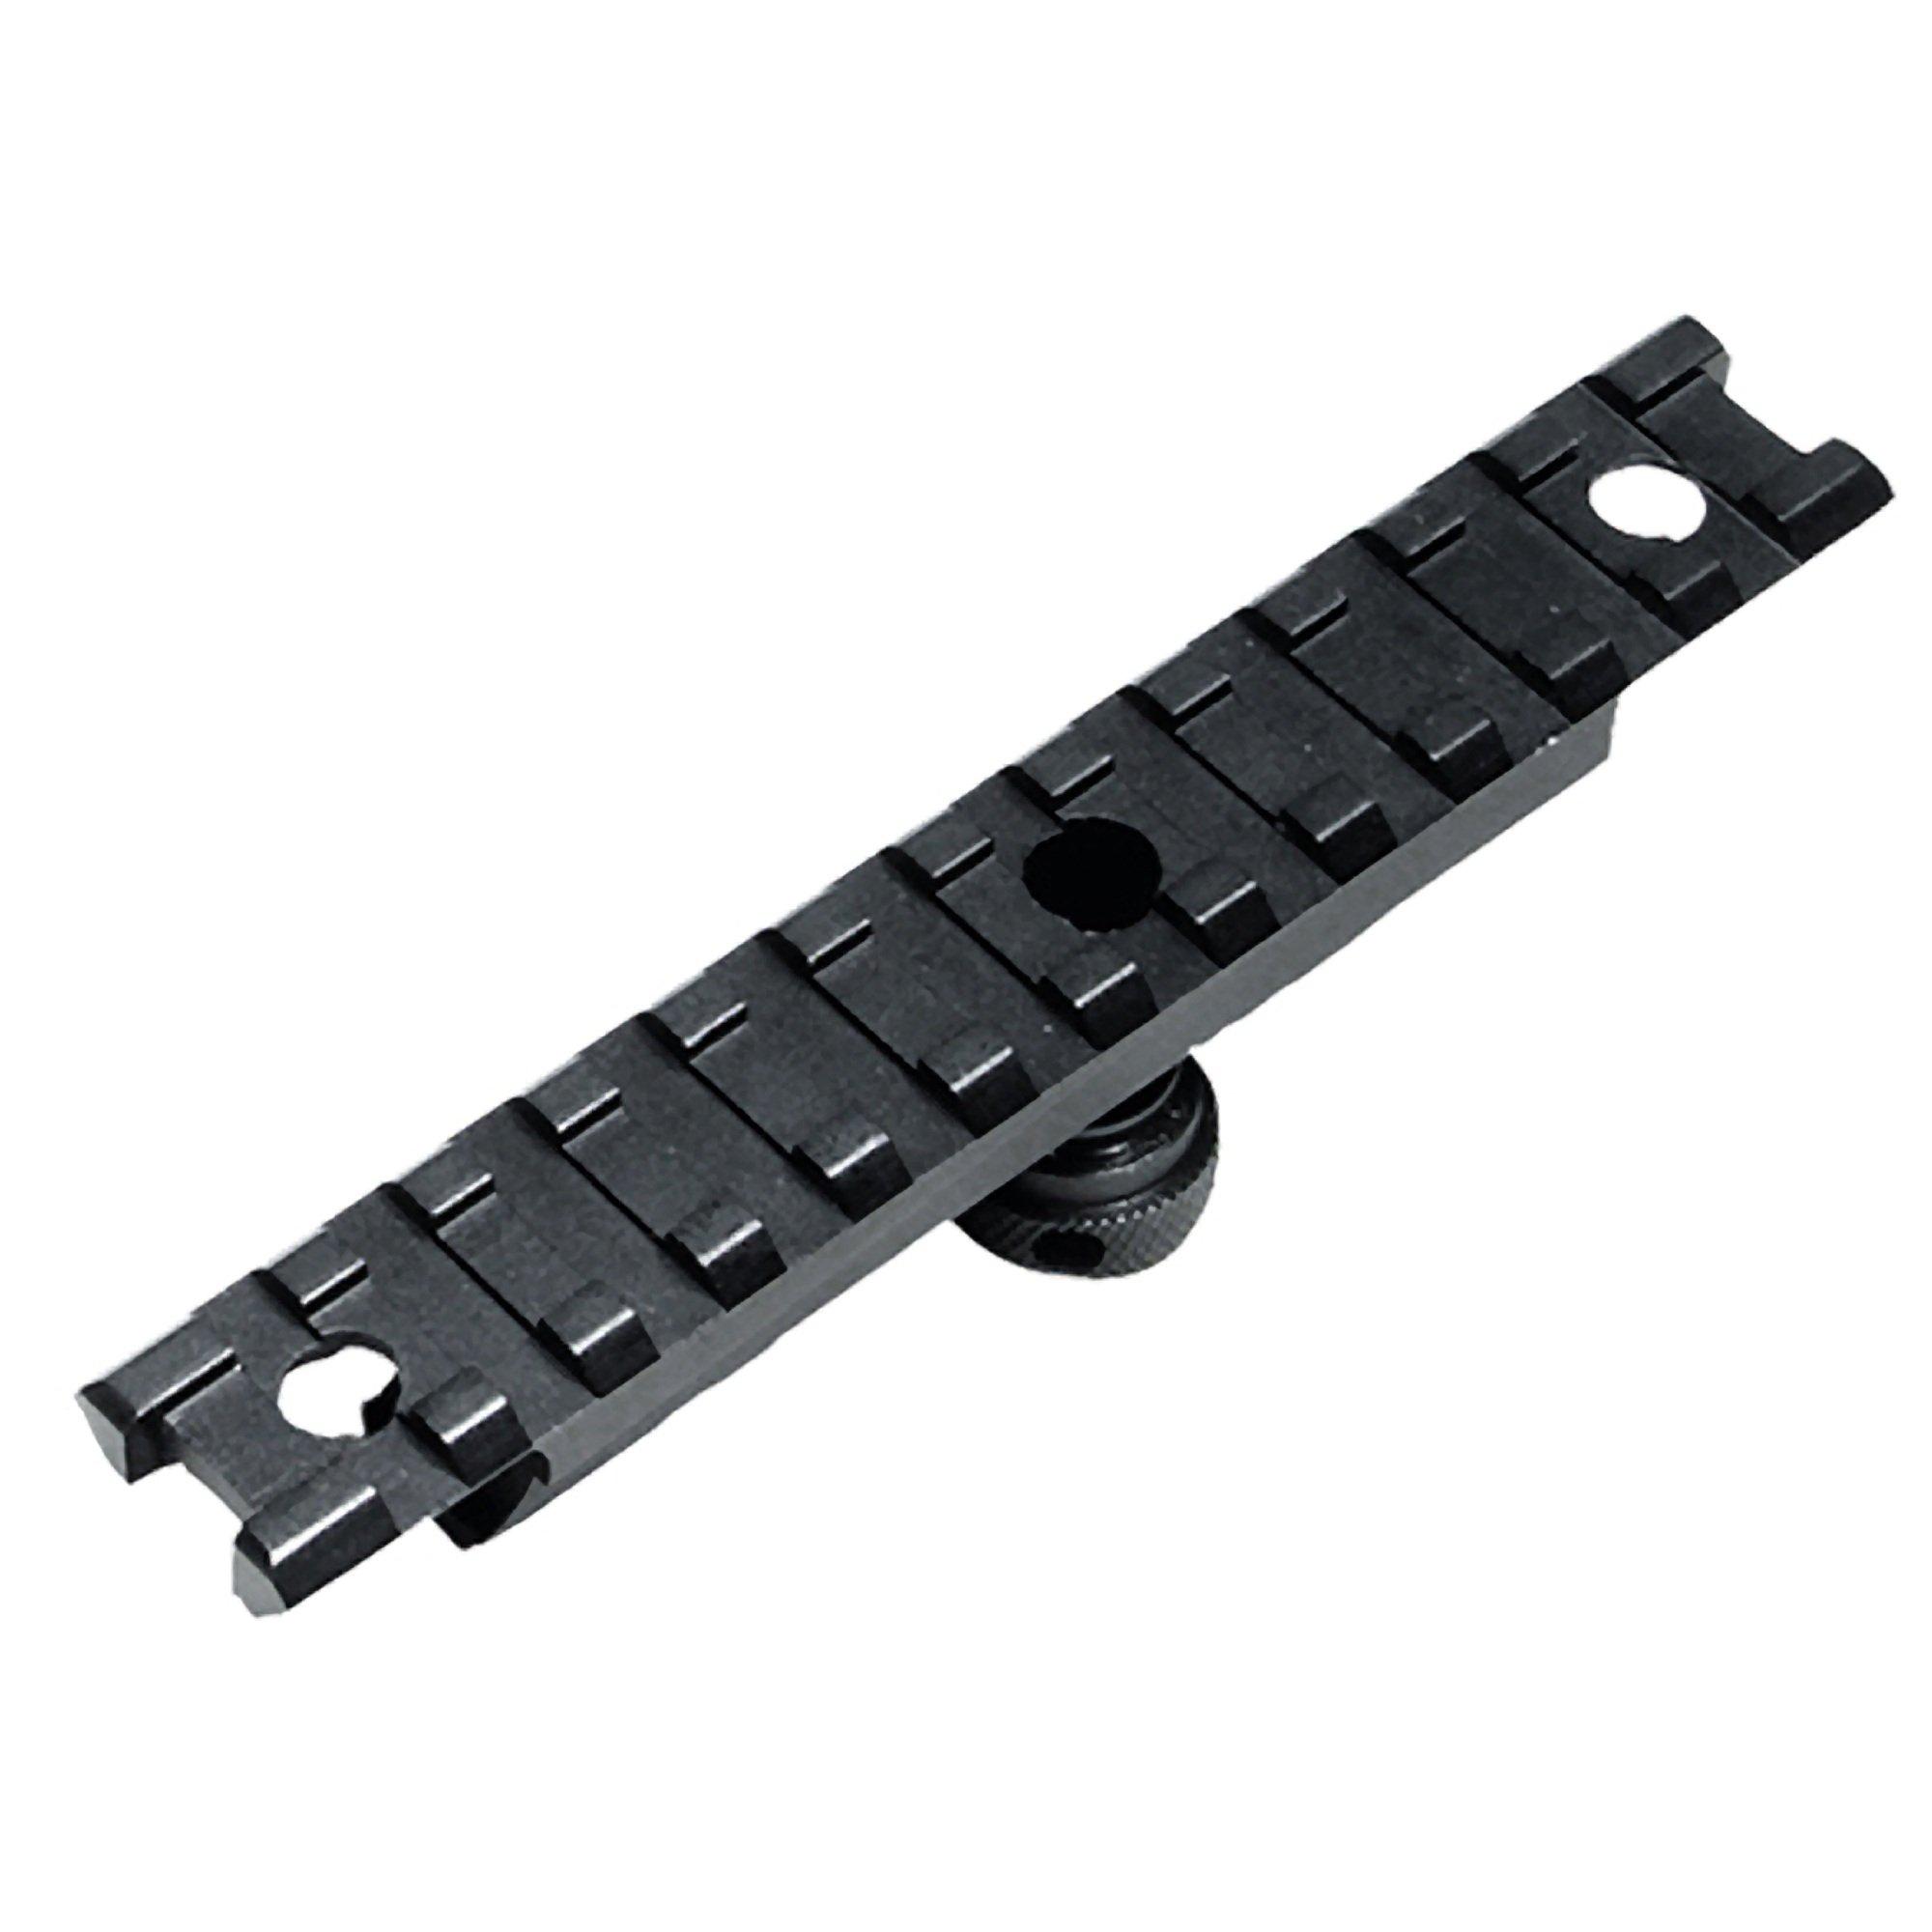 UTG AR15 Carry Handle Rail Mount, 12 Slots, STANAG